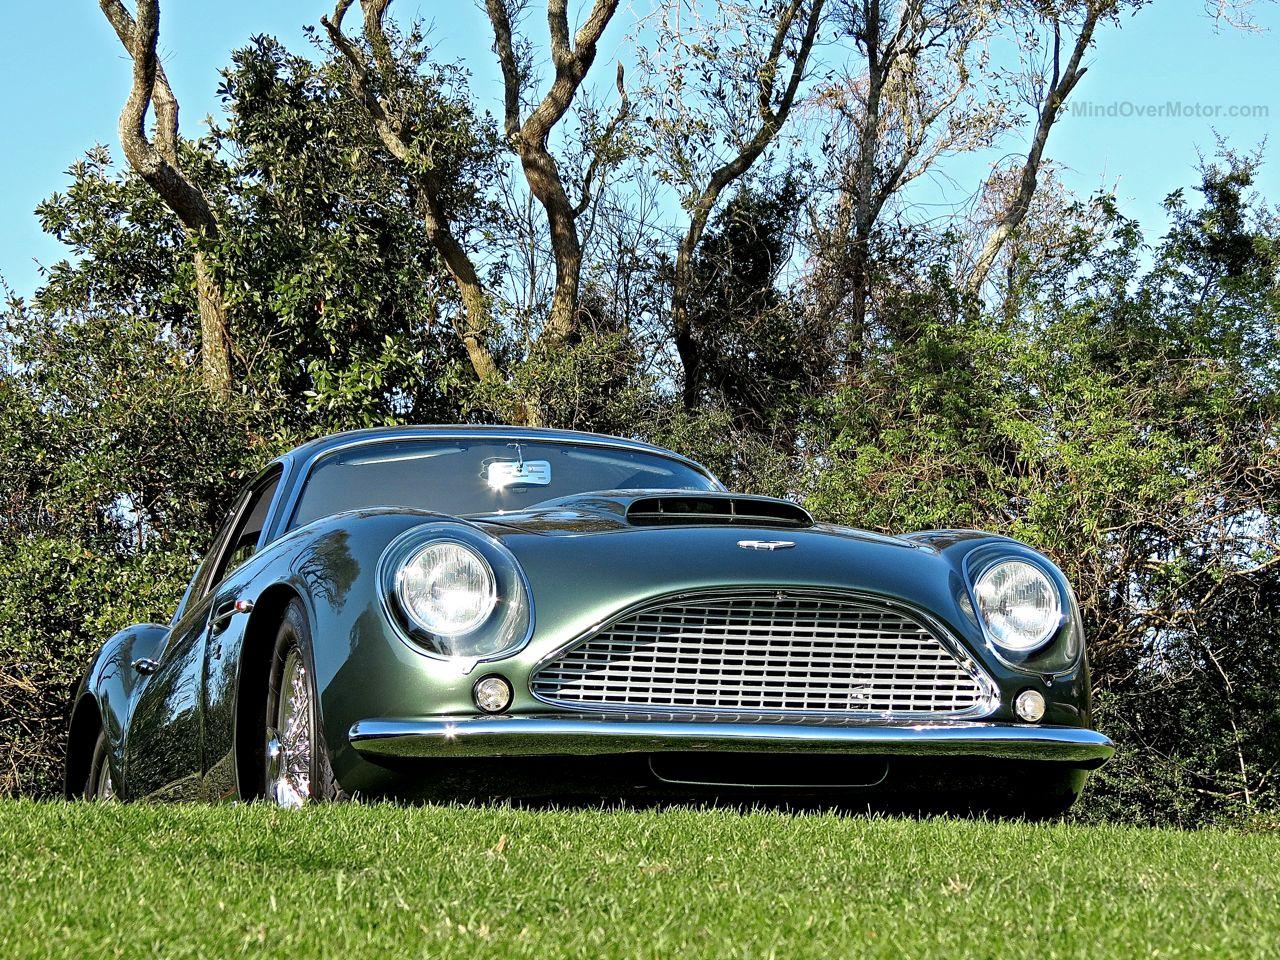 Aston Martin DB4 GT Zagato Amelia Island 2